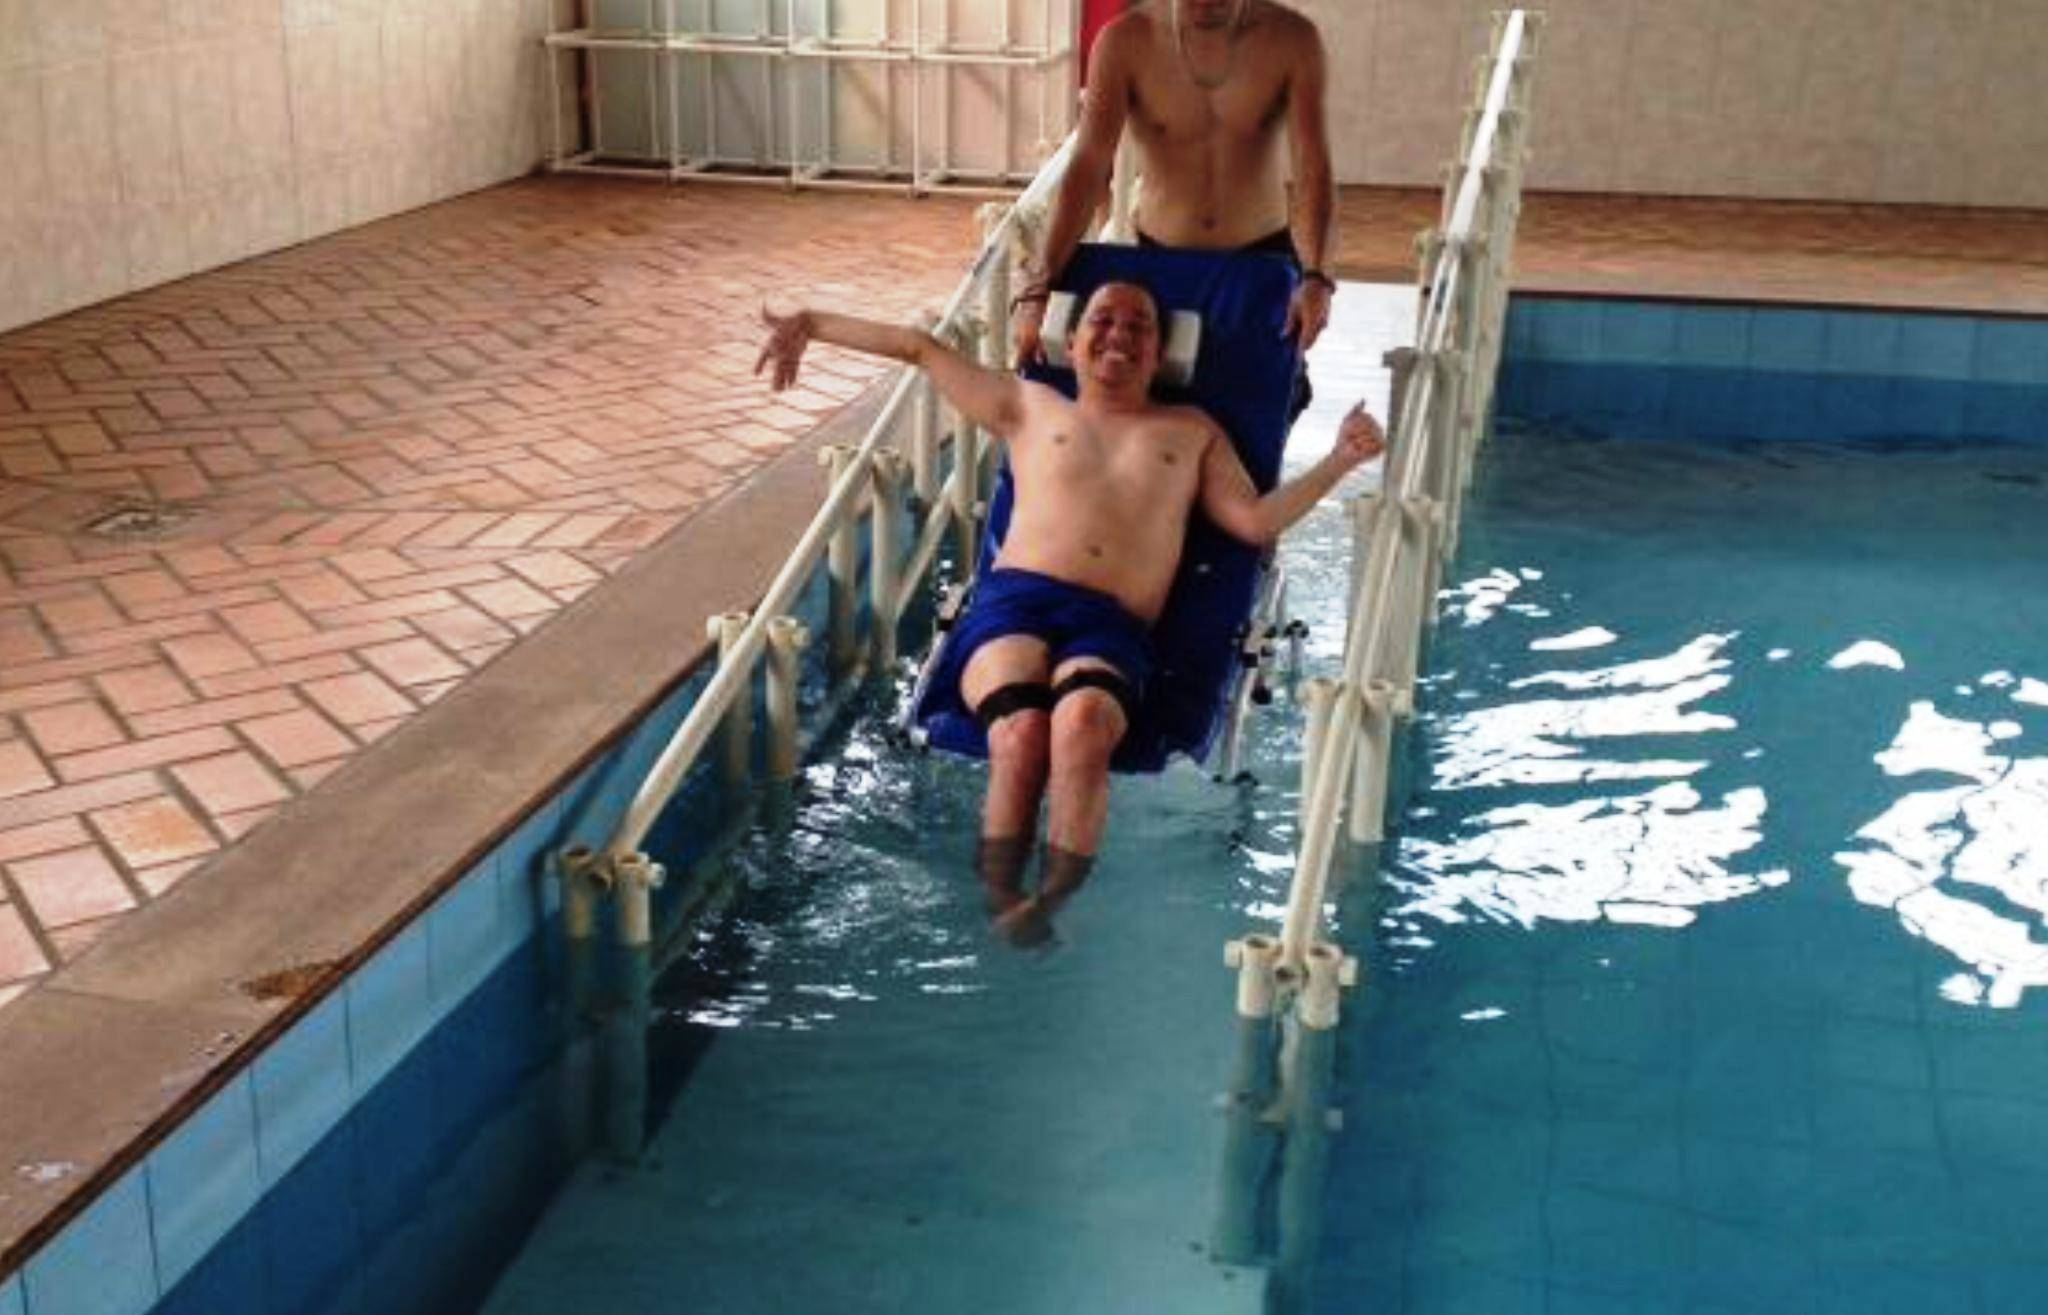 APAE SRPQ cadeirante descendo a rampa assistido por profissional